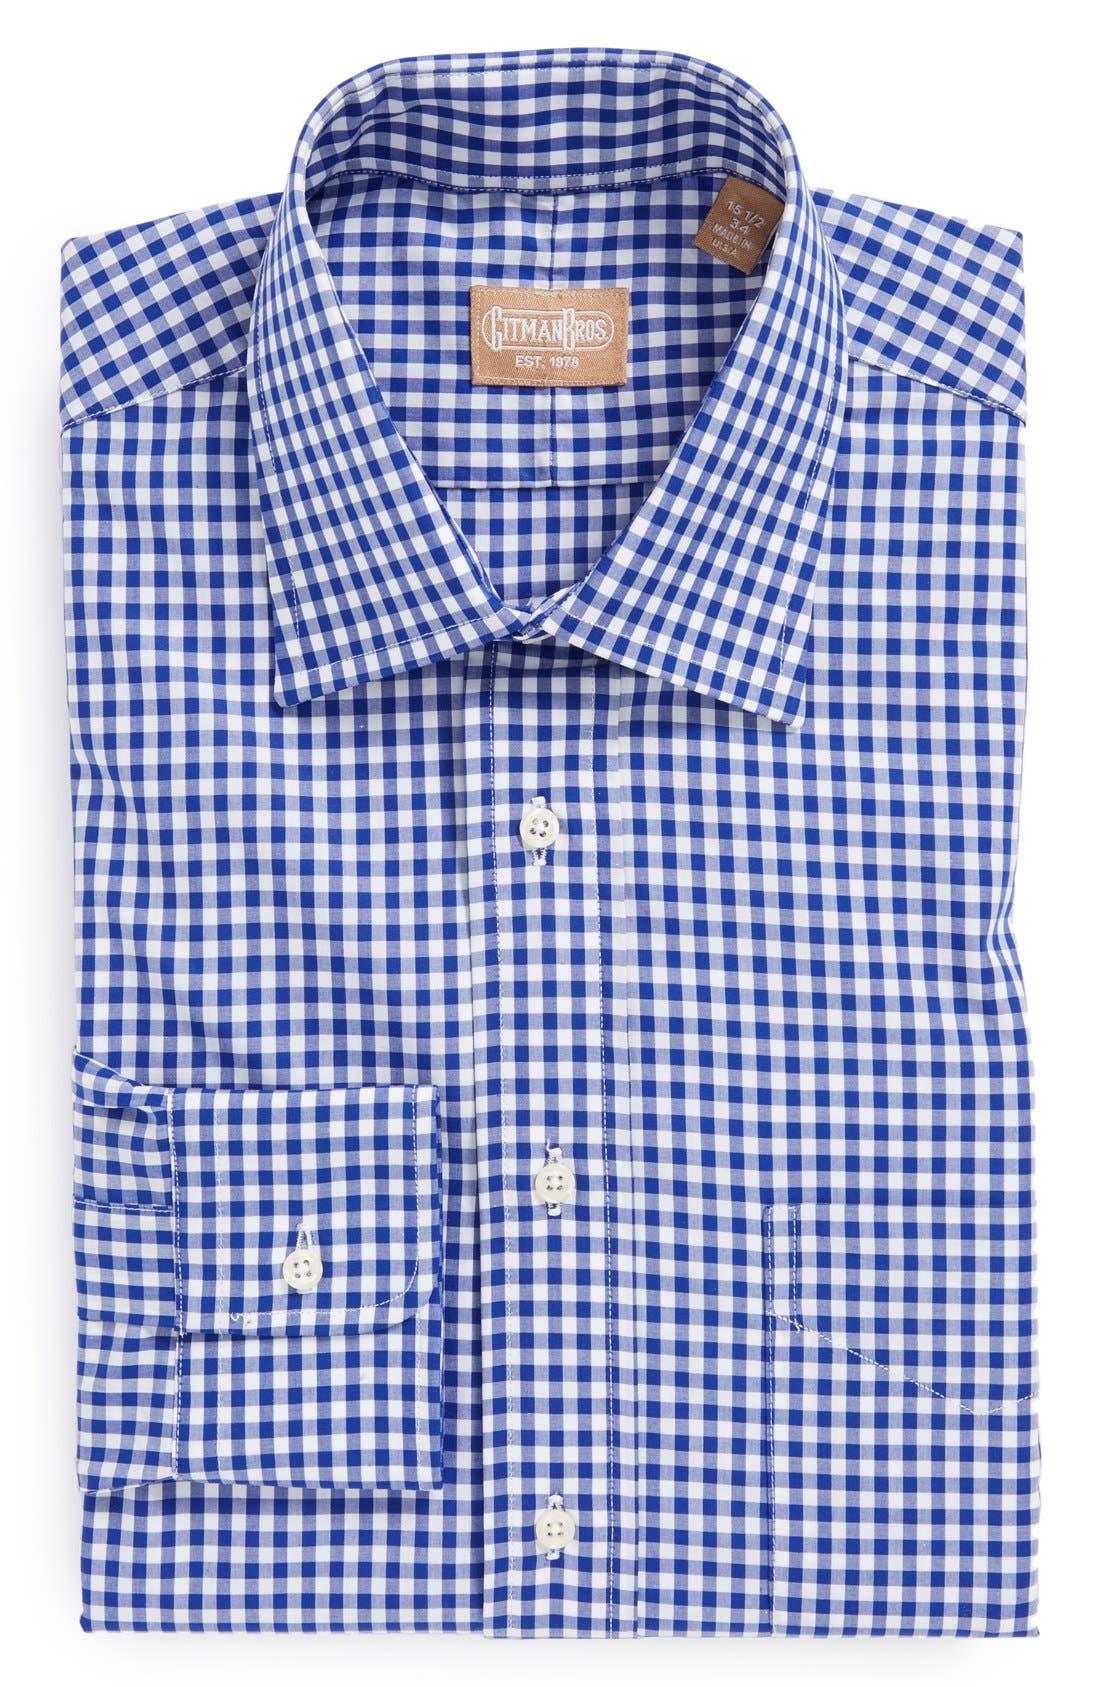 Regular Fit Cotton Gingham English Spread Collar Dress Shirt,                         Main,                         color, Blue